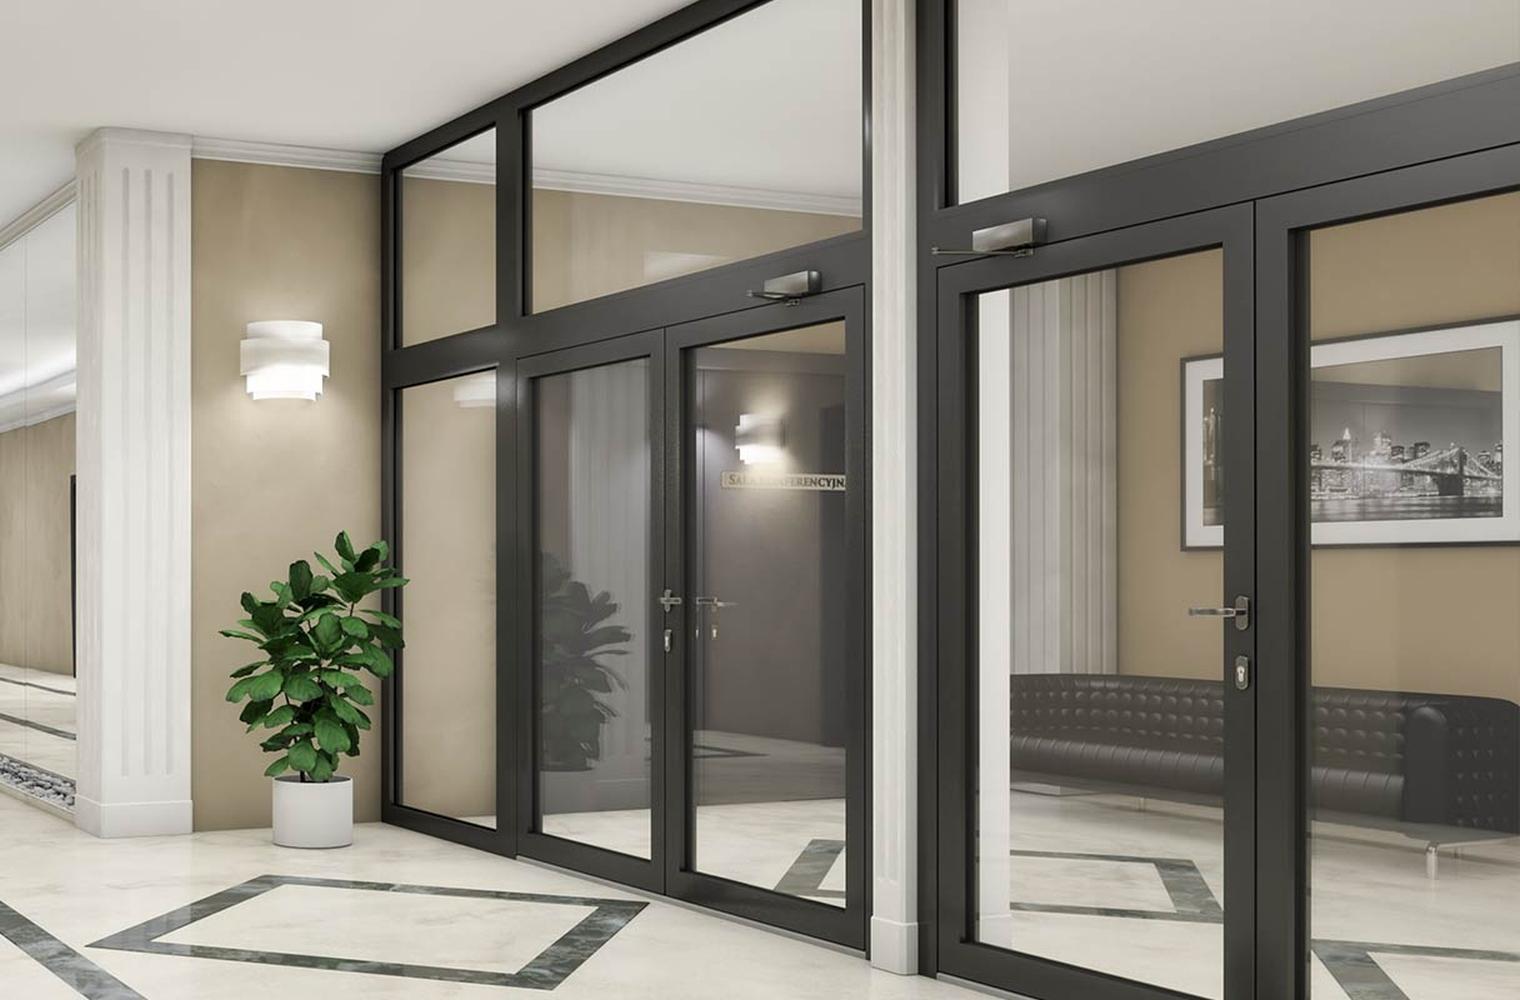 Fabulous Treppenhaus Fenster | günstig online kaufen - fensterblick.de AT91